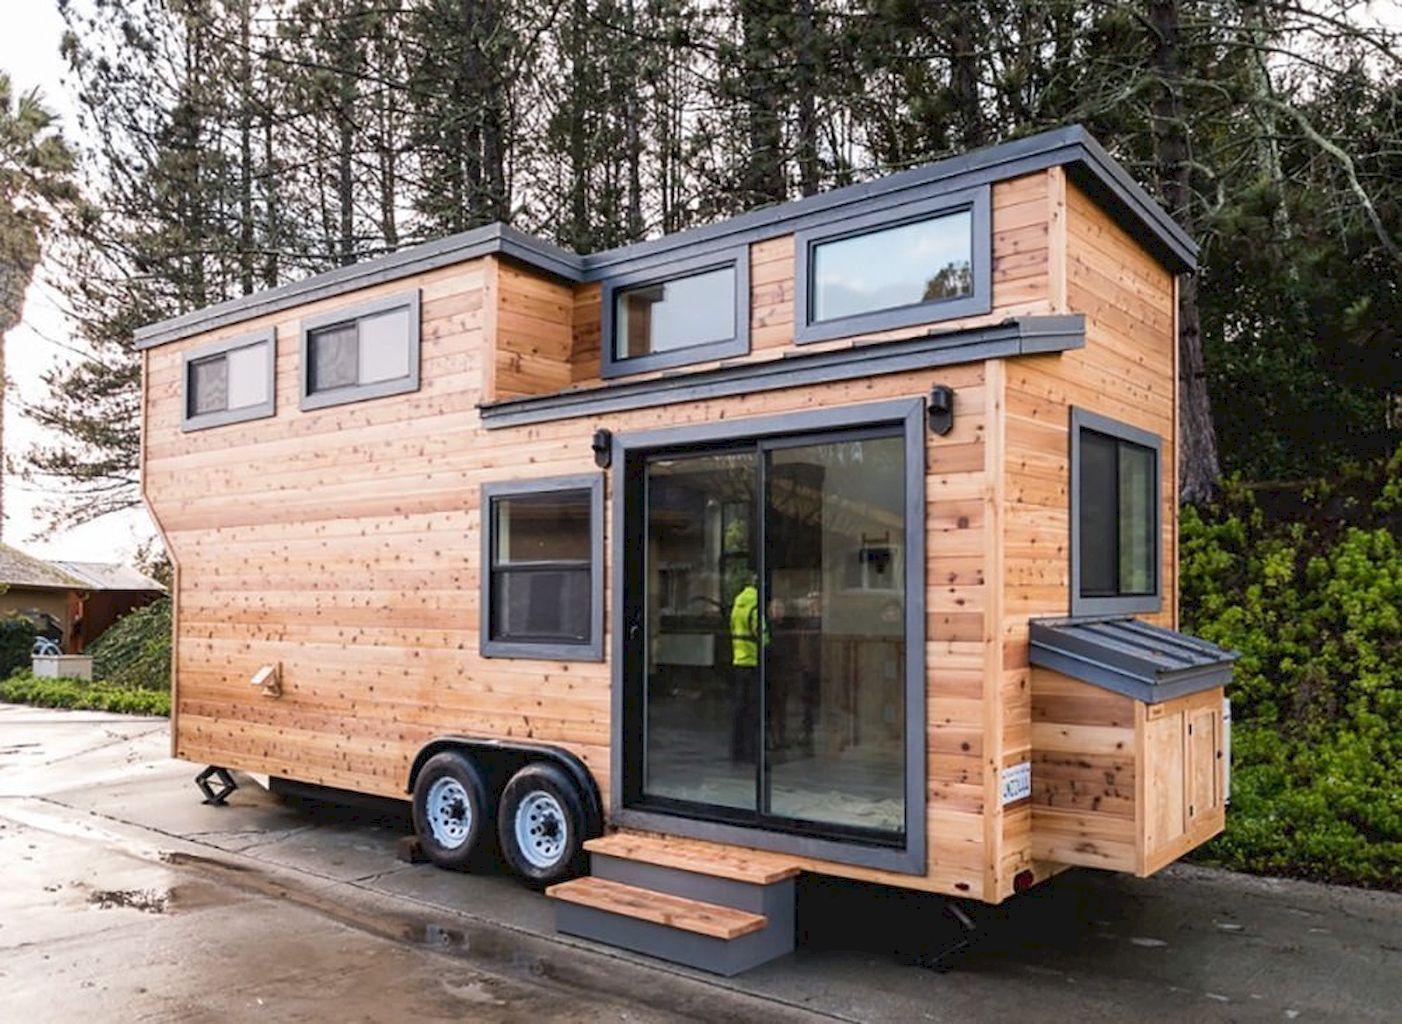 Gorgeous Best 25 Tiny House Design Ideas Https Livingmarch Com Best 25 Tiny House Design Ideas Tiny House Exterior Tiny Mobile House Tiny House California